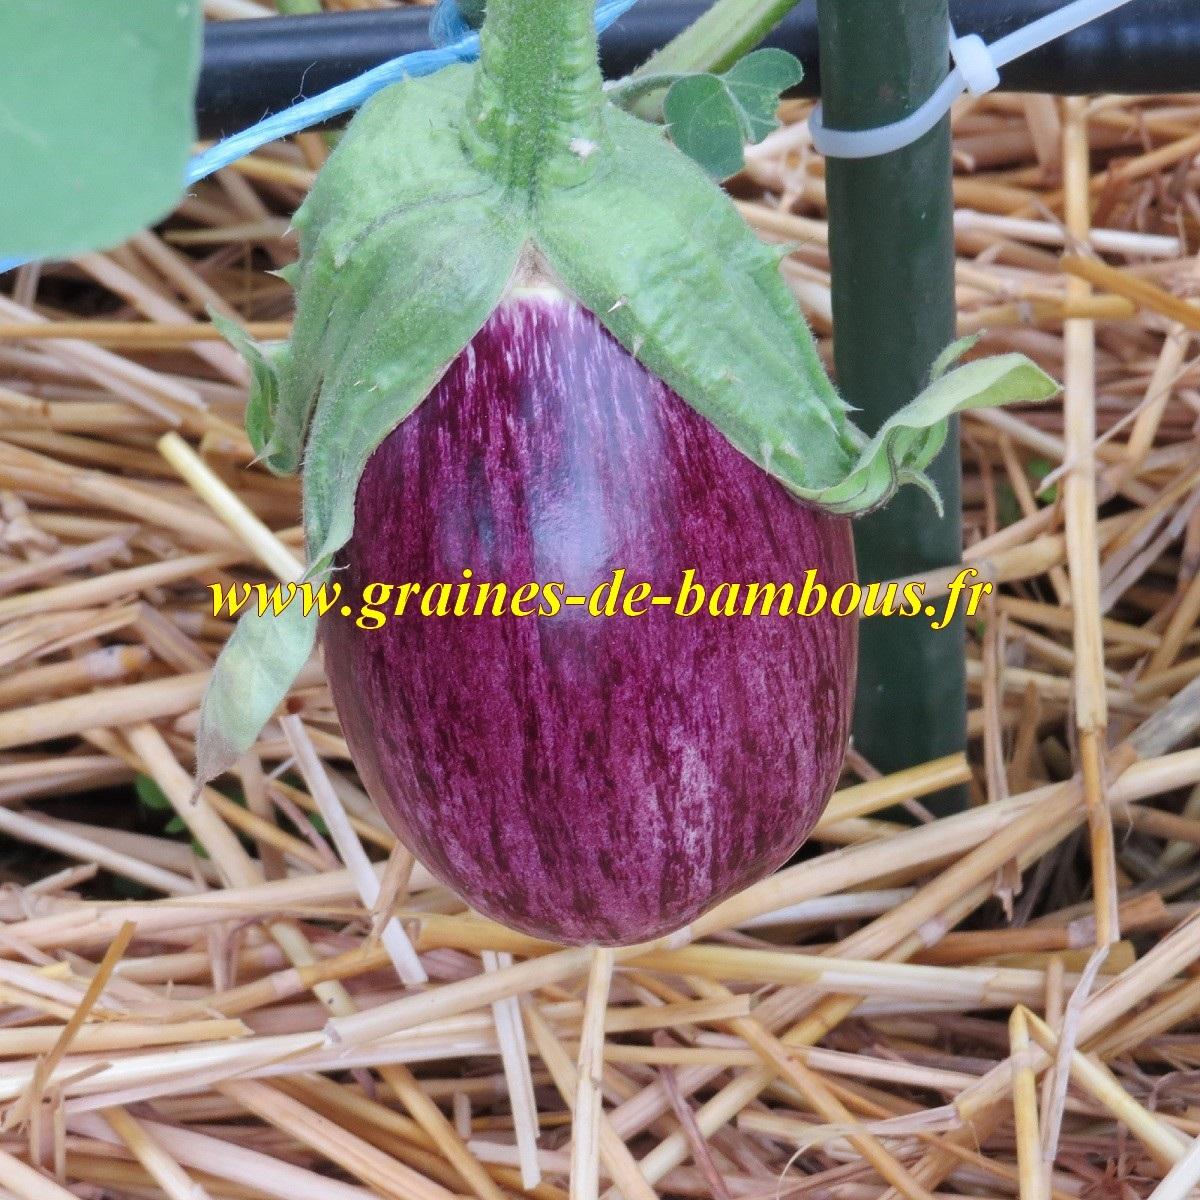 Graines aubergine tsakoniki fruit